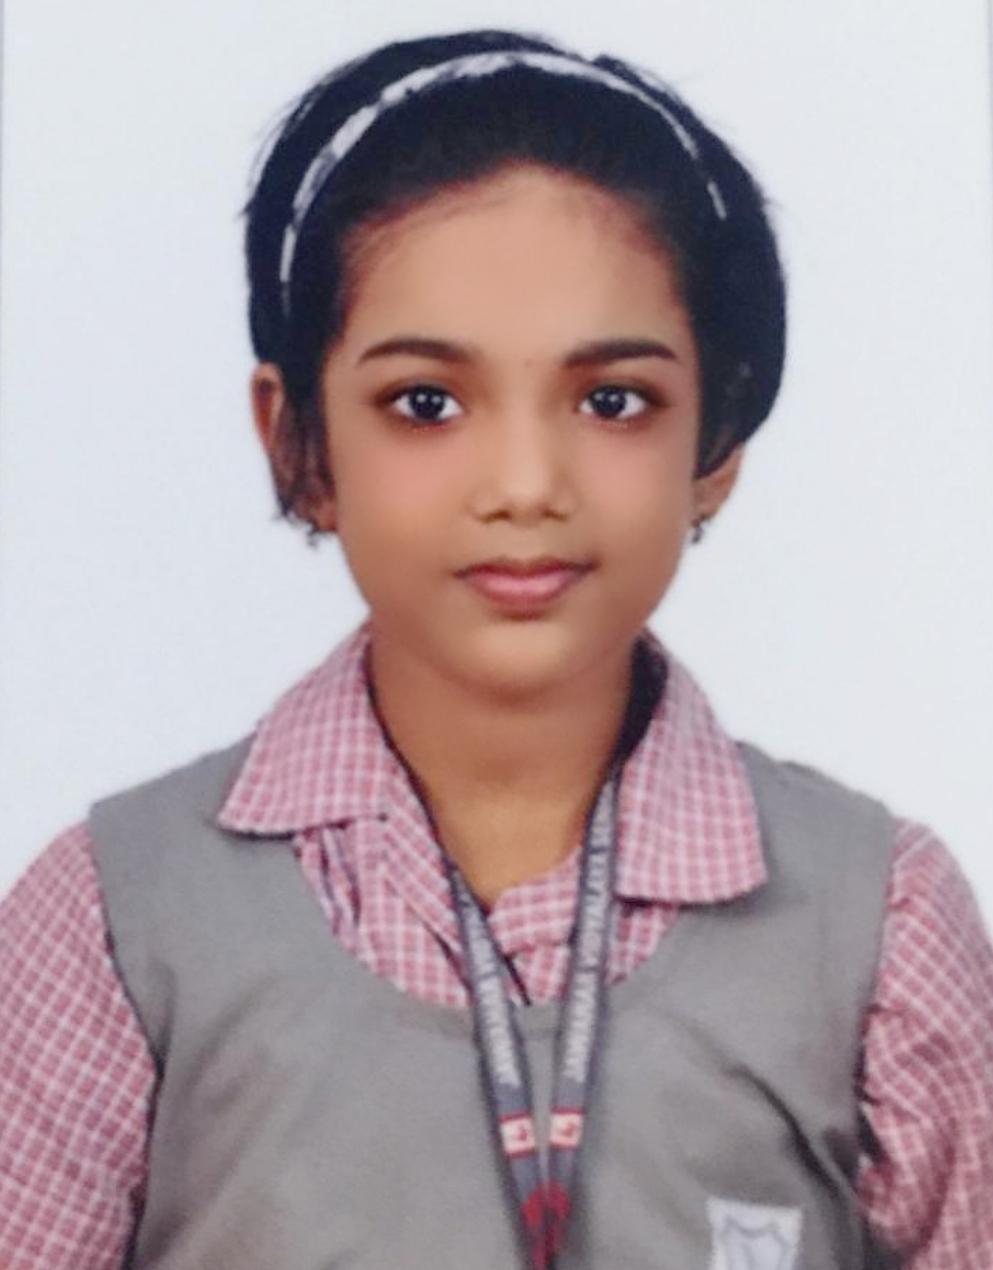 Hanshita won the 4th Chess Gurukul Inter for Indian Students